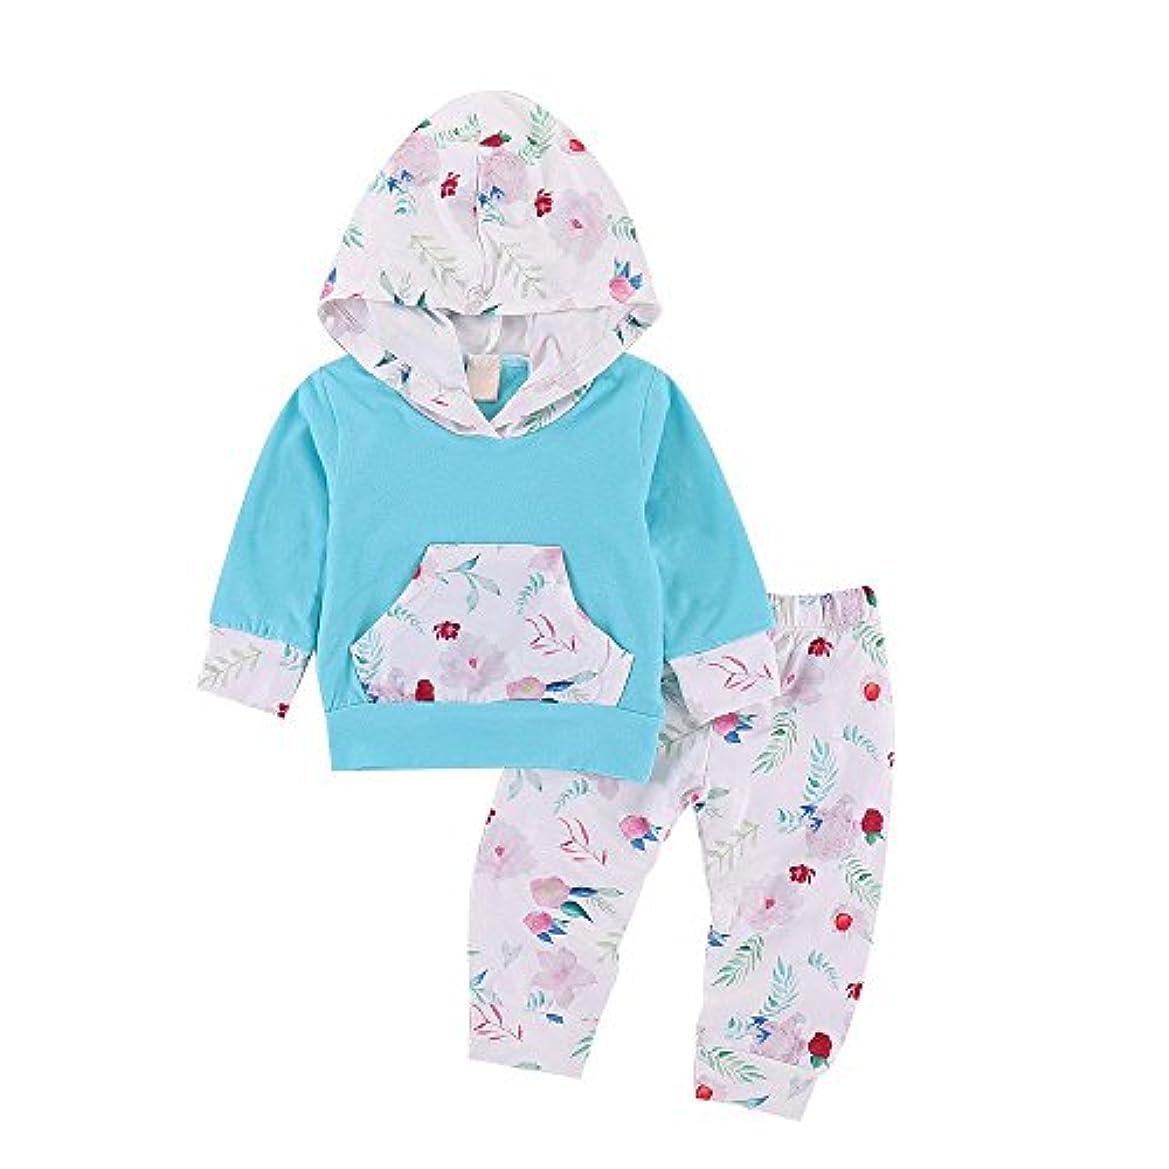 BHKK 子供 幼児少年少女少女の長袖フラワーパーカーズトップスとパンツのコスチューム 6ヶ月 - 24ヶ月 24ヶ月